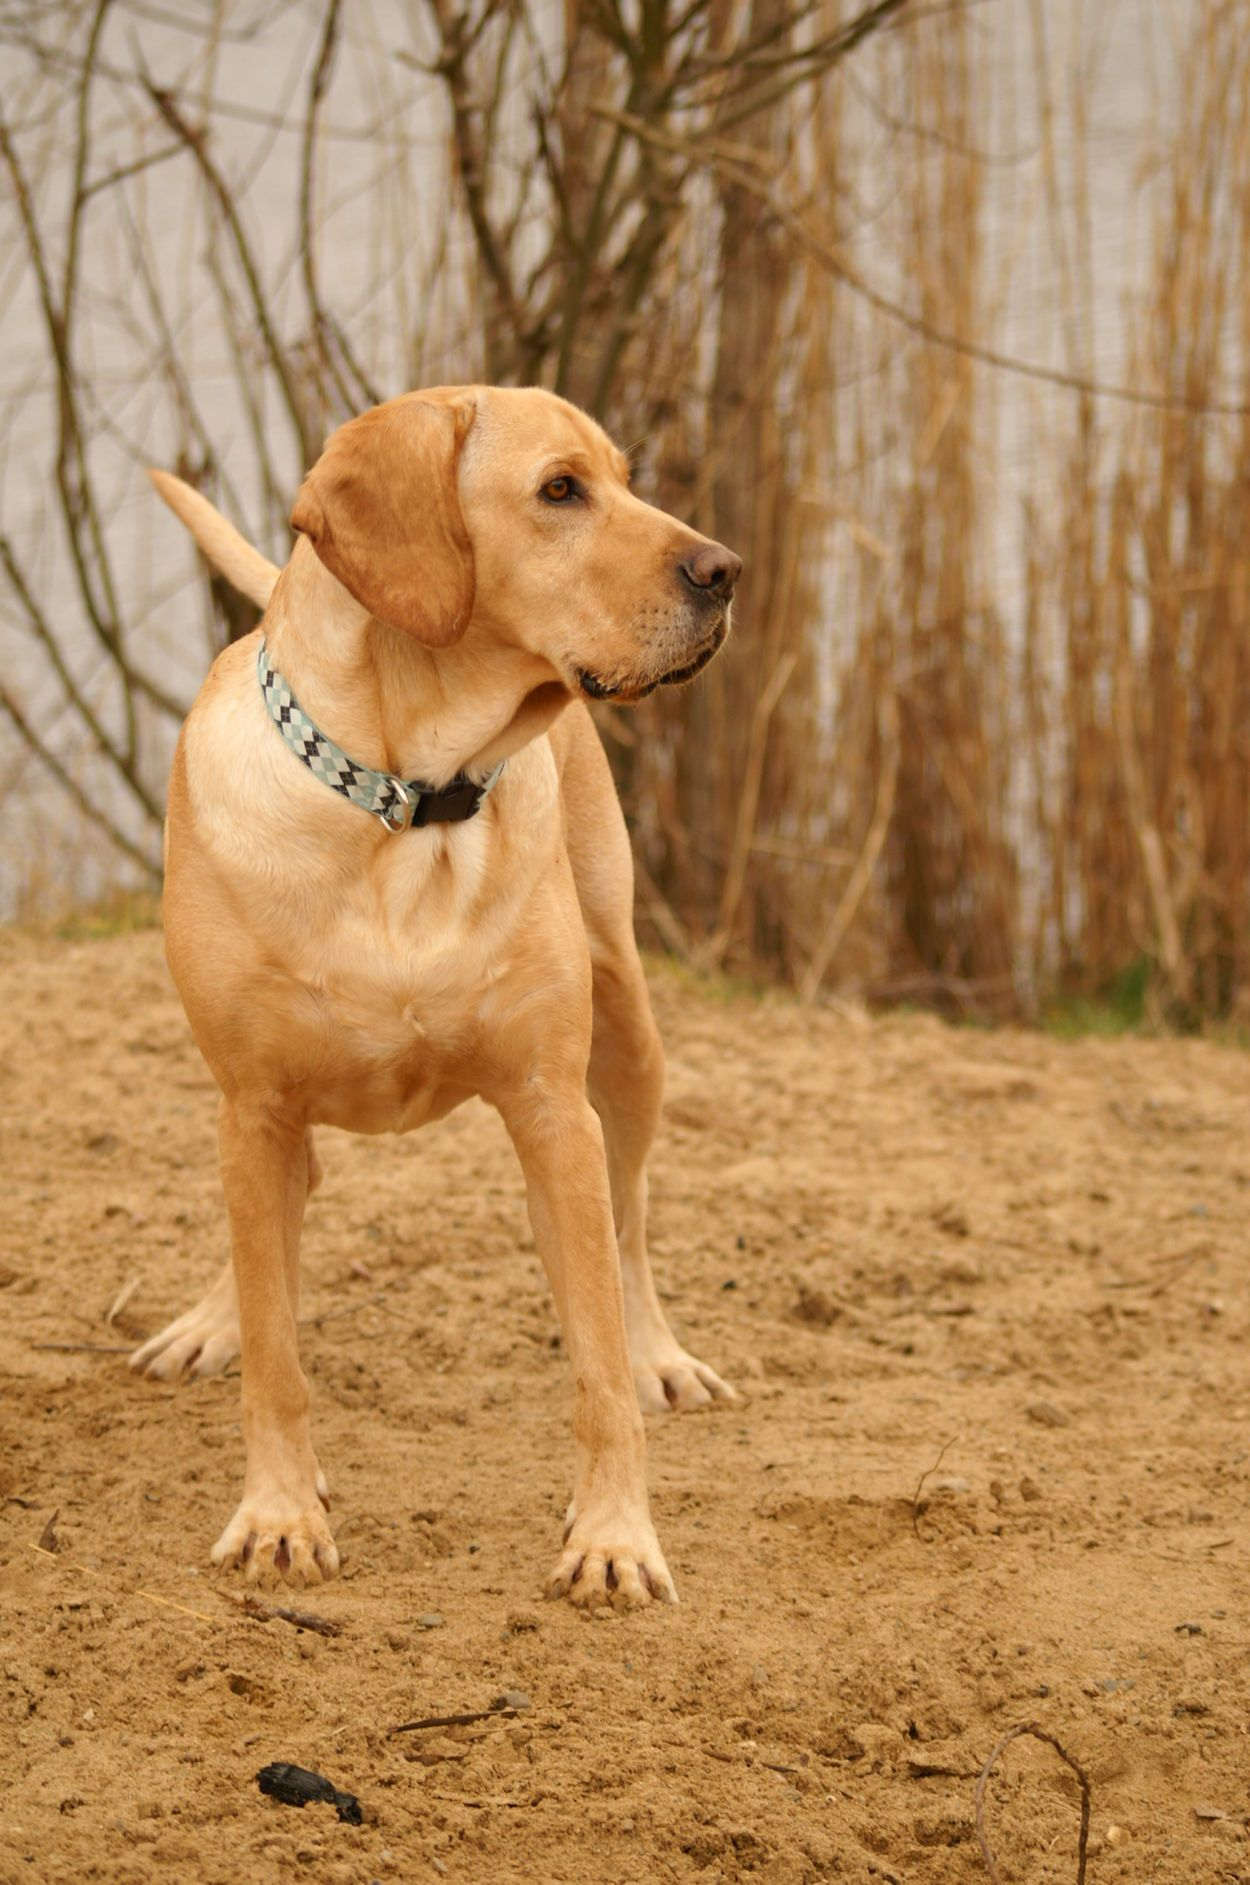 Dog Pets Animal One Animal Domestic Animals Golden